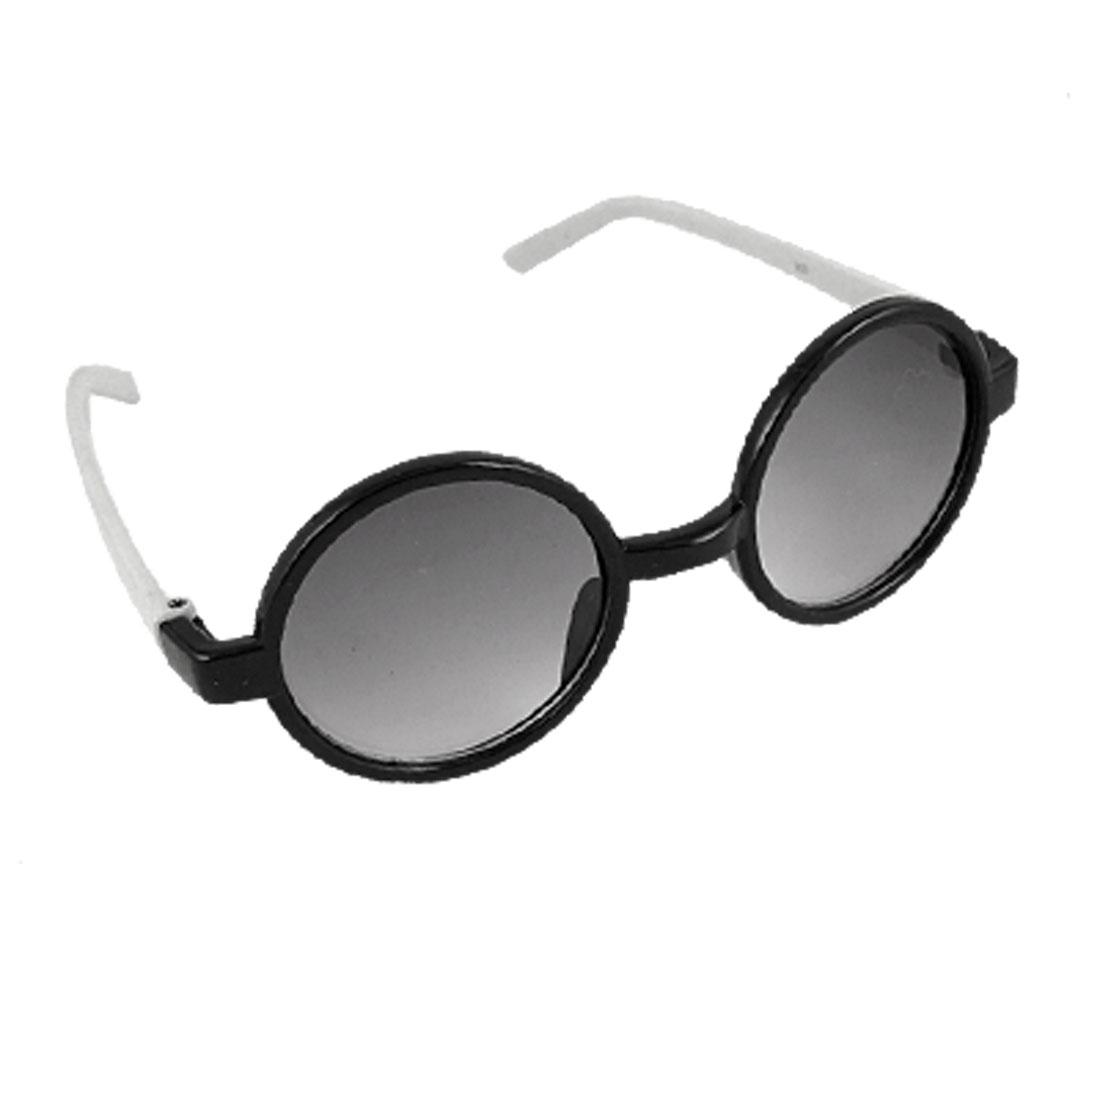 Round Dark Lens Black Rim White Arms Plastic Sunglasses for Children